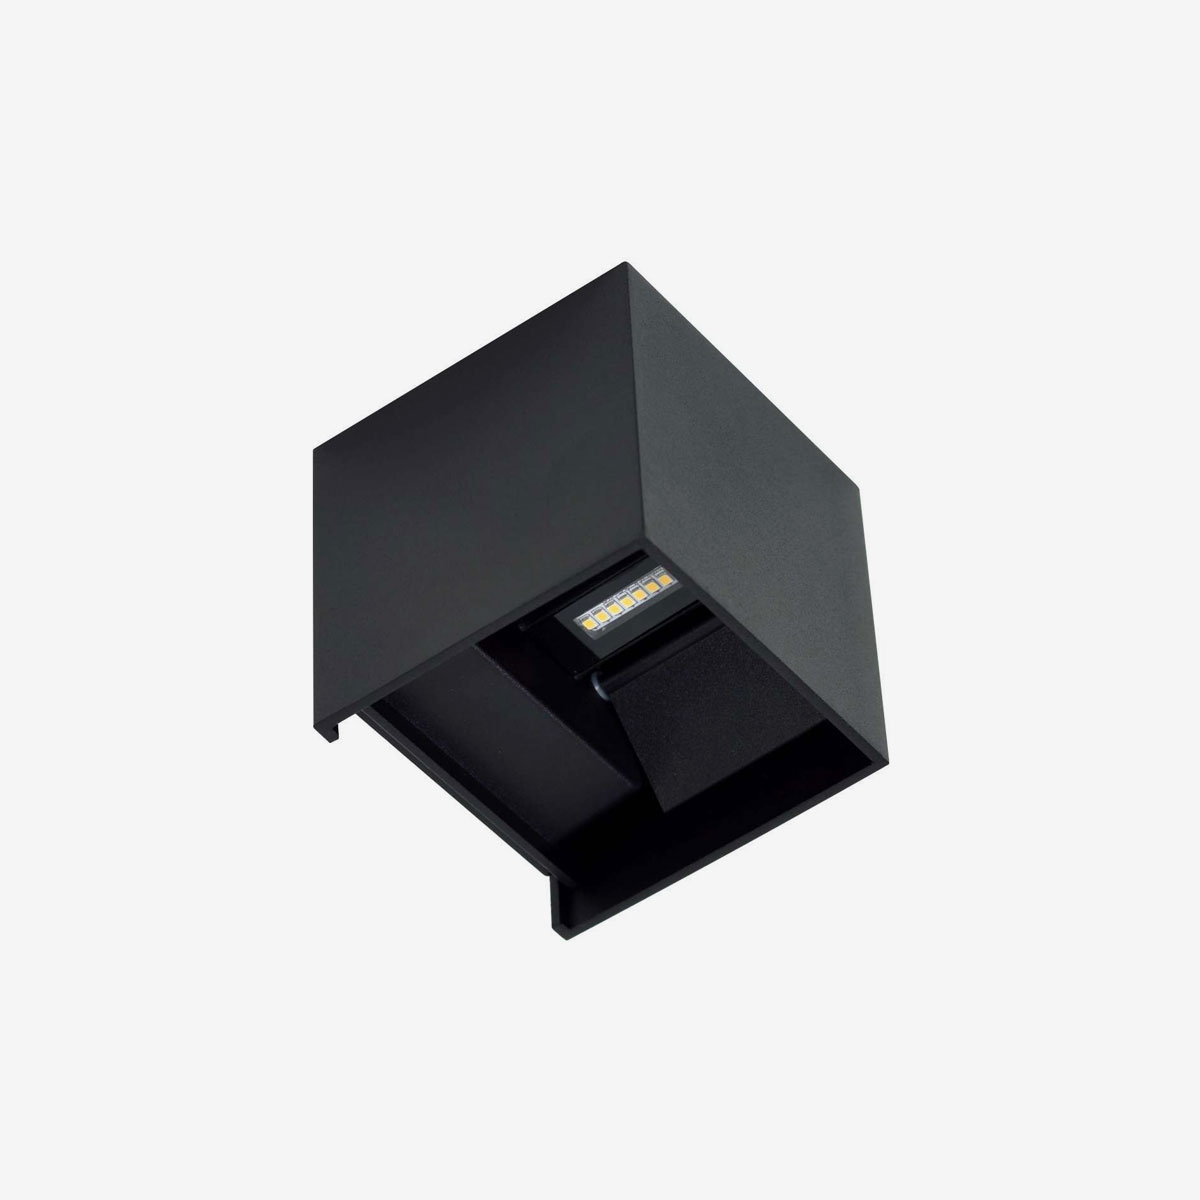 Aplique LED decorativo exterior antracita